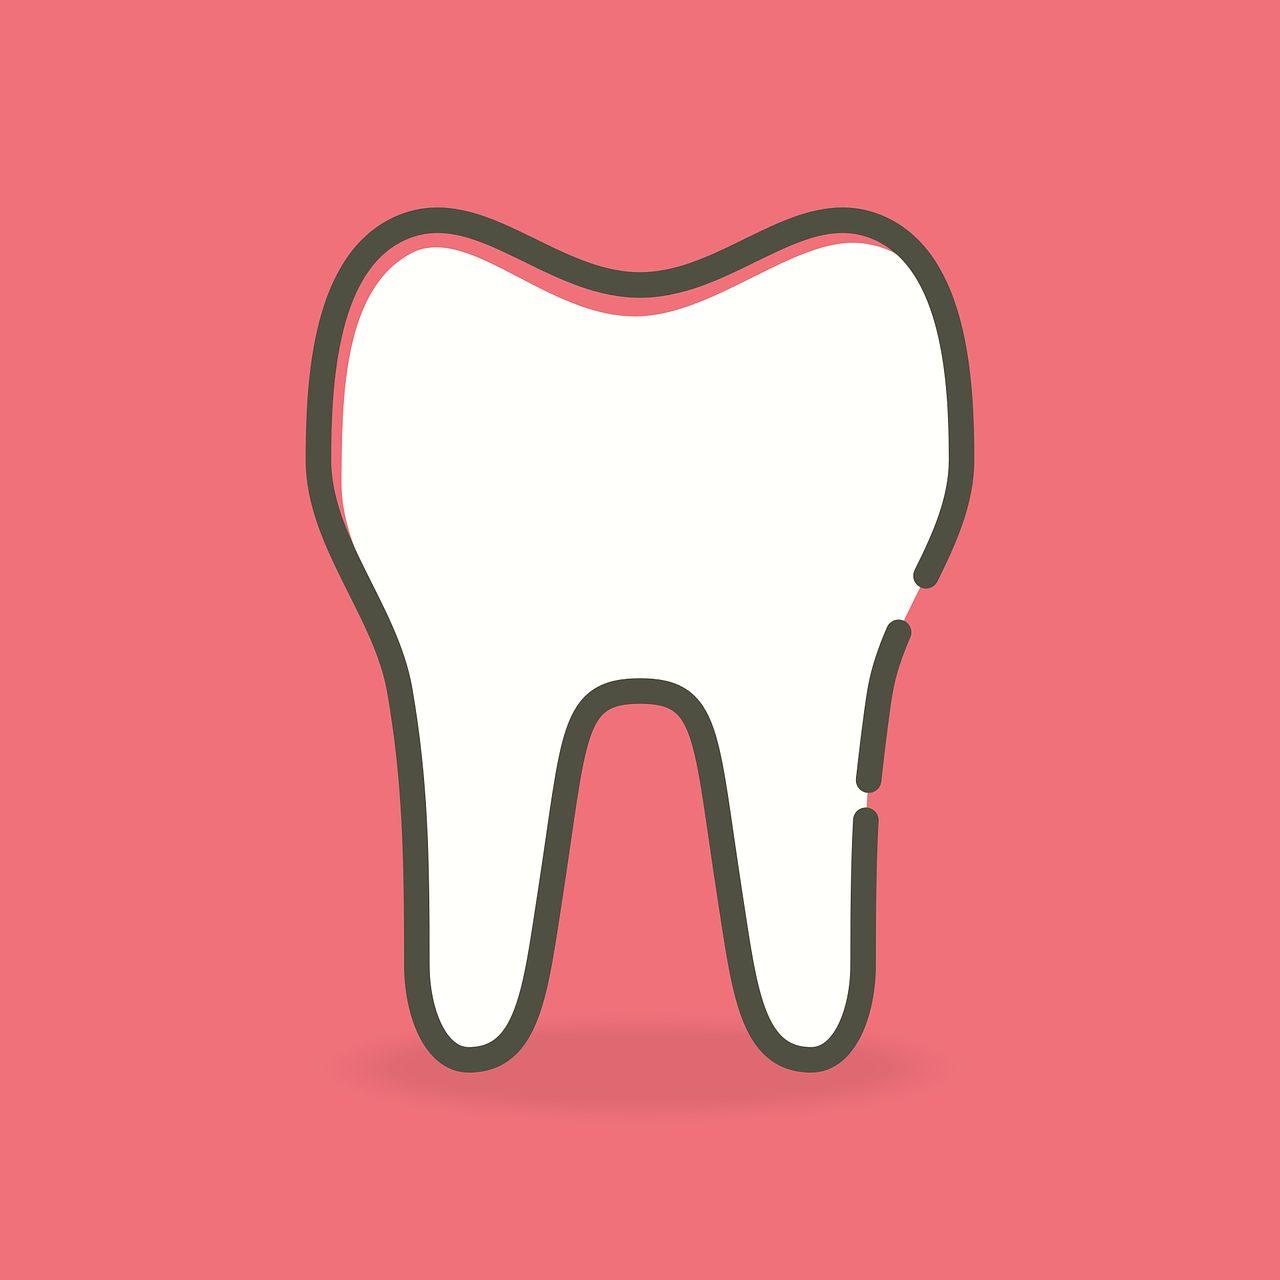 Kayser Tandartsenpraktijk J Z tandartspraktijk